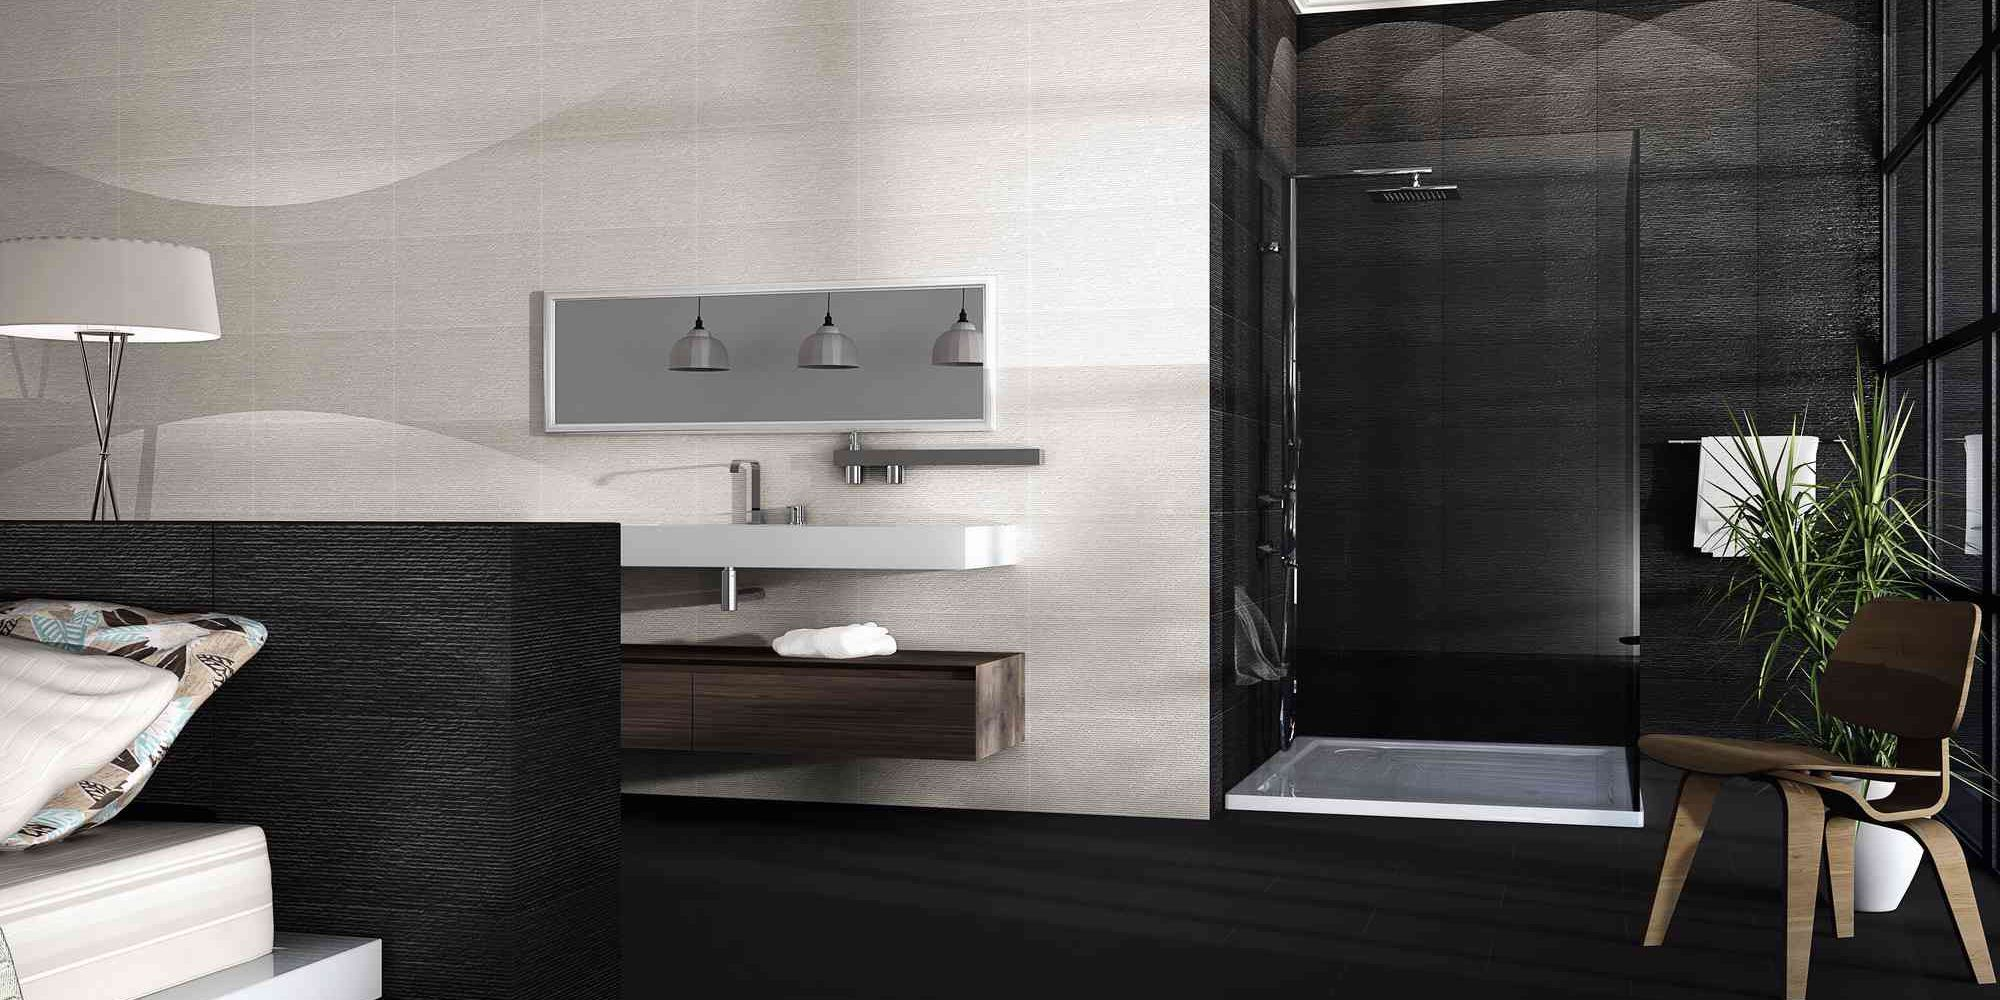 Home Tiles Kitchen Floor Ontario Gris Wall Tile 31x56cm Bathroom